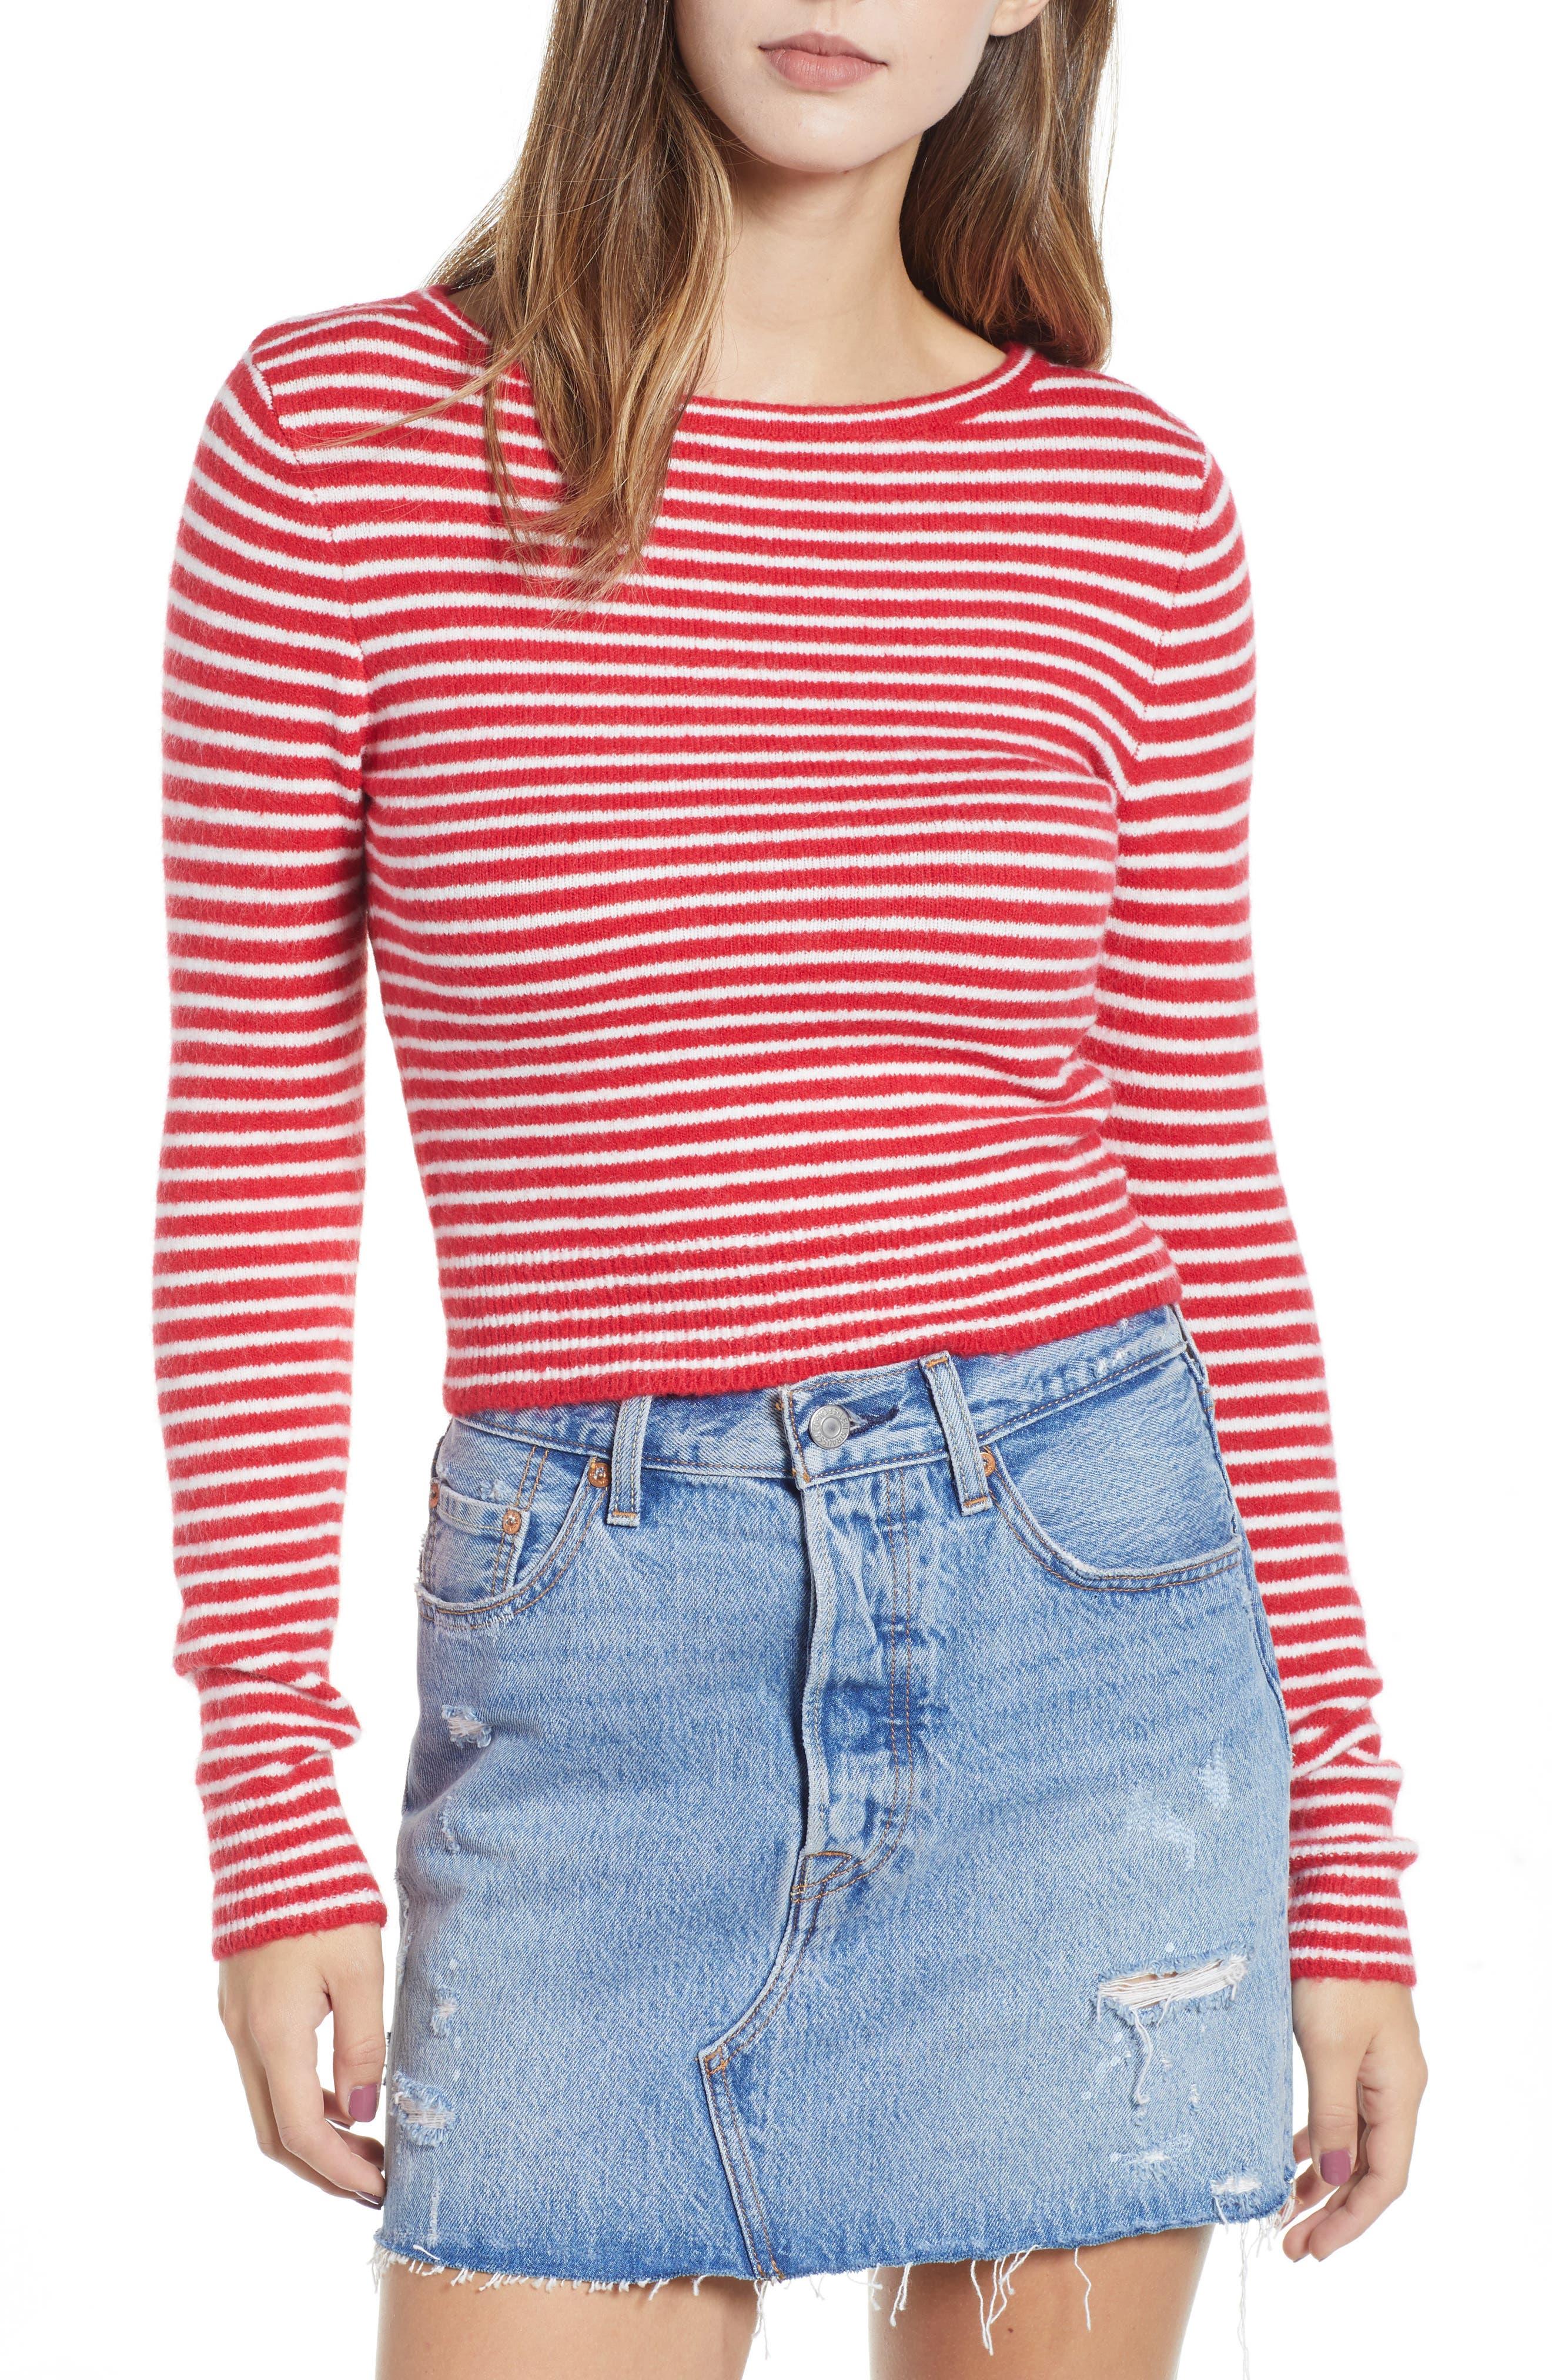 AMUSE SOCIETY Nova Stripe Crop Sweater in Red